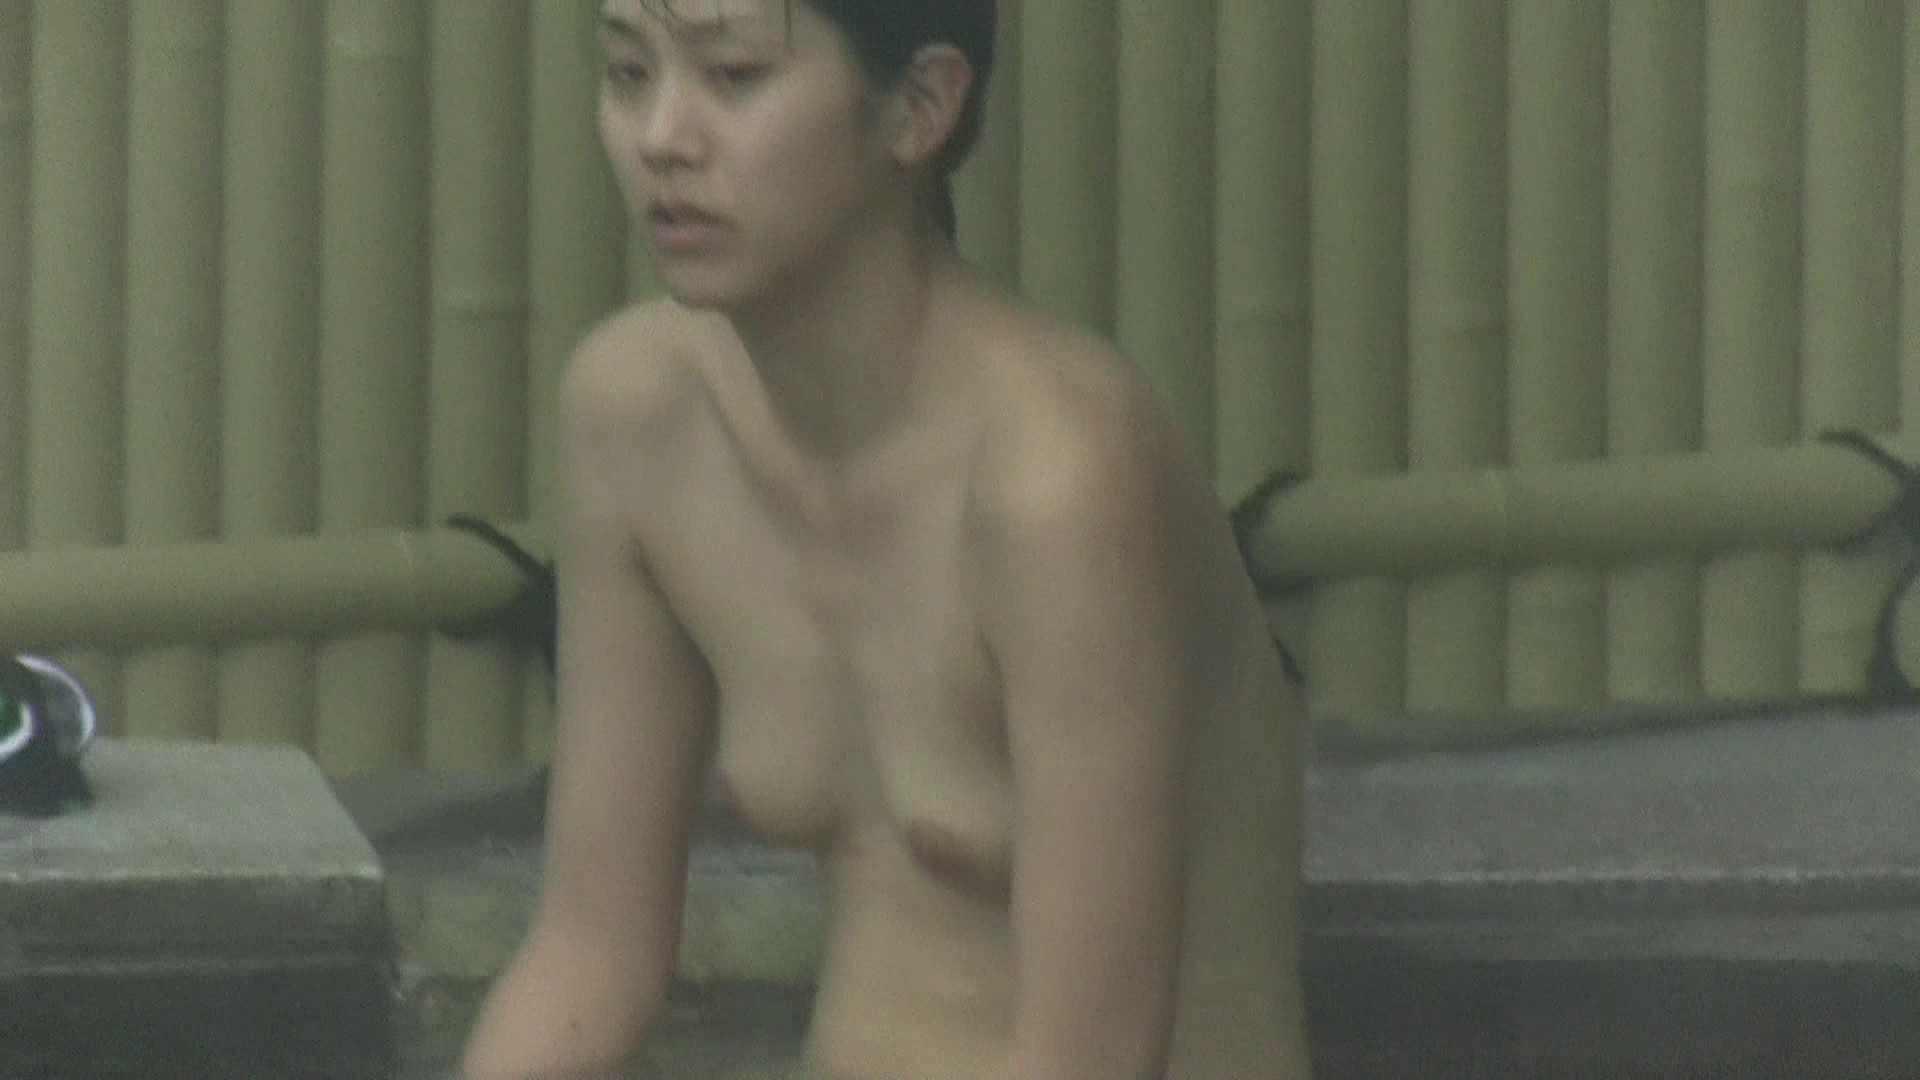 Aquaな露天風呂Vol.174 盗撮シリーズ | 露天風呂編  86PIX 15